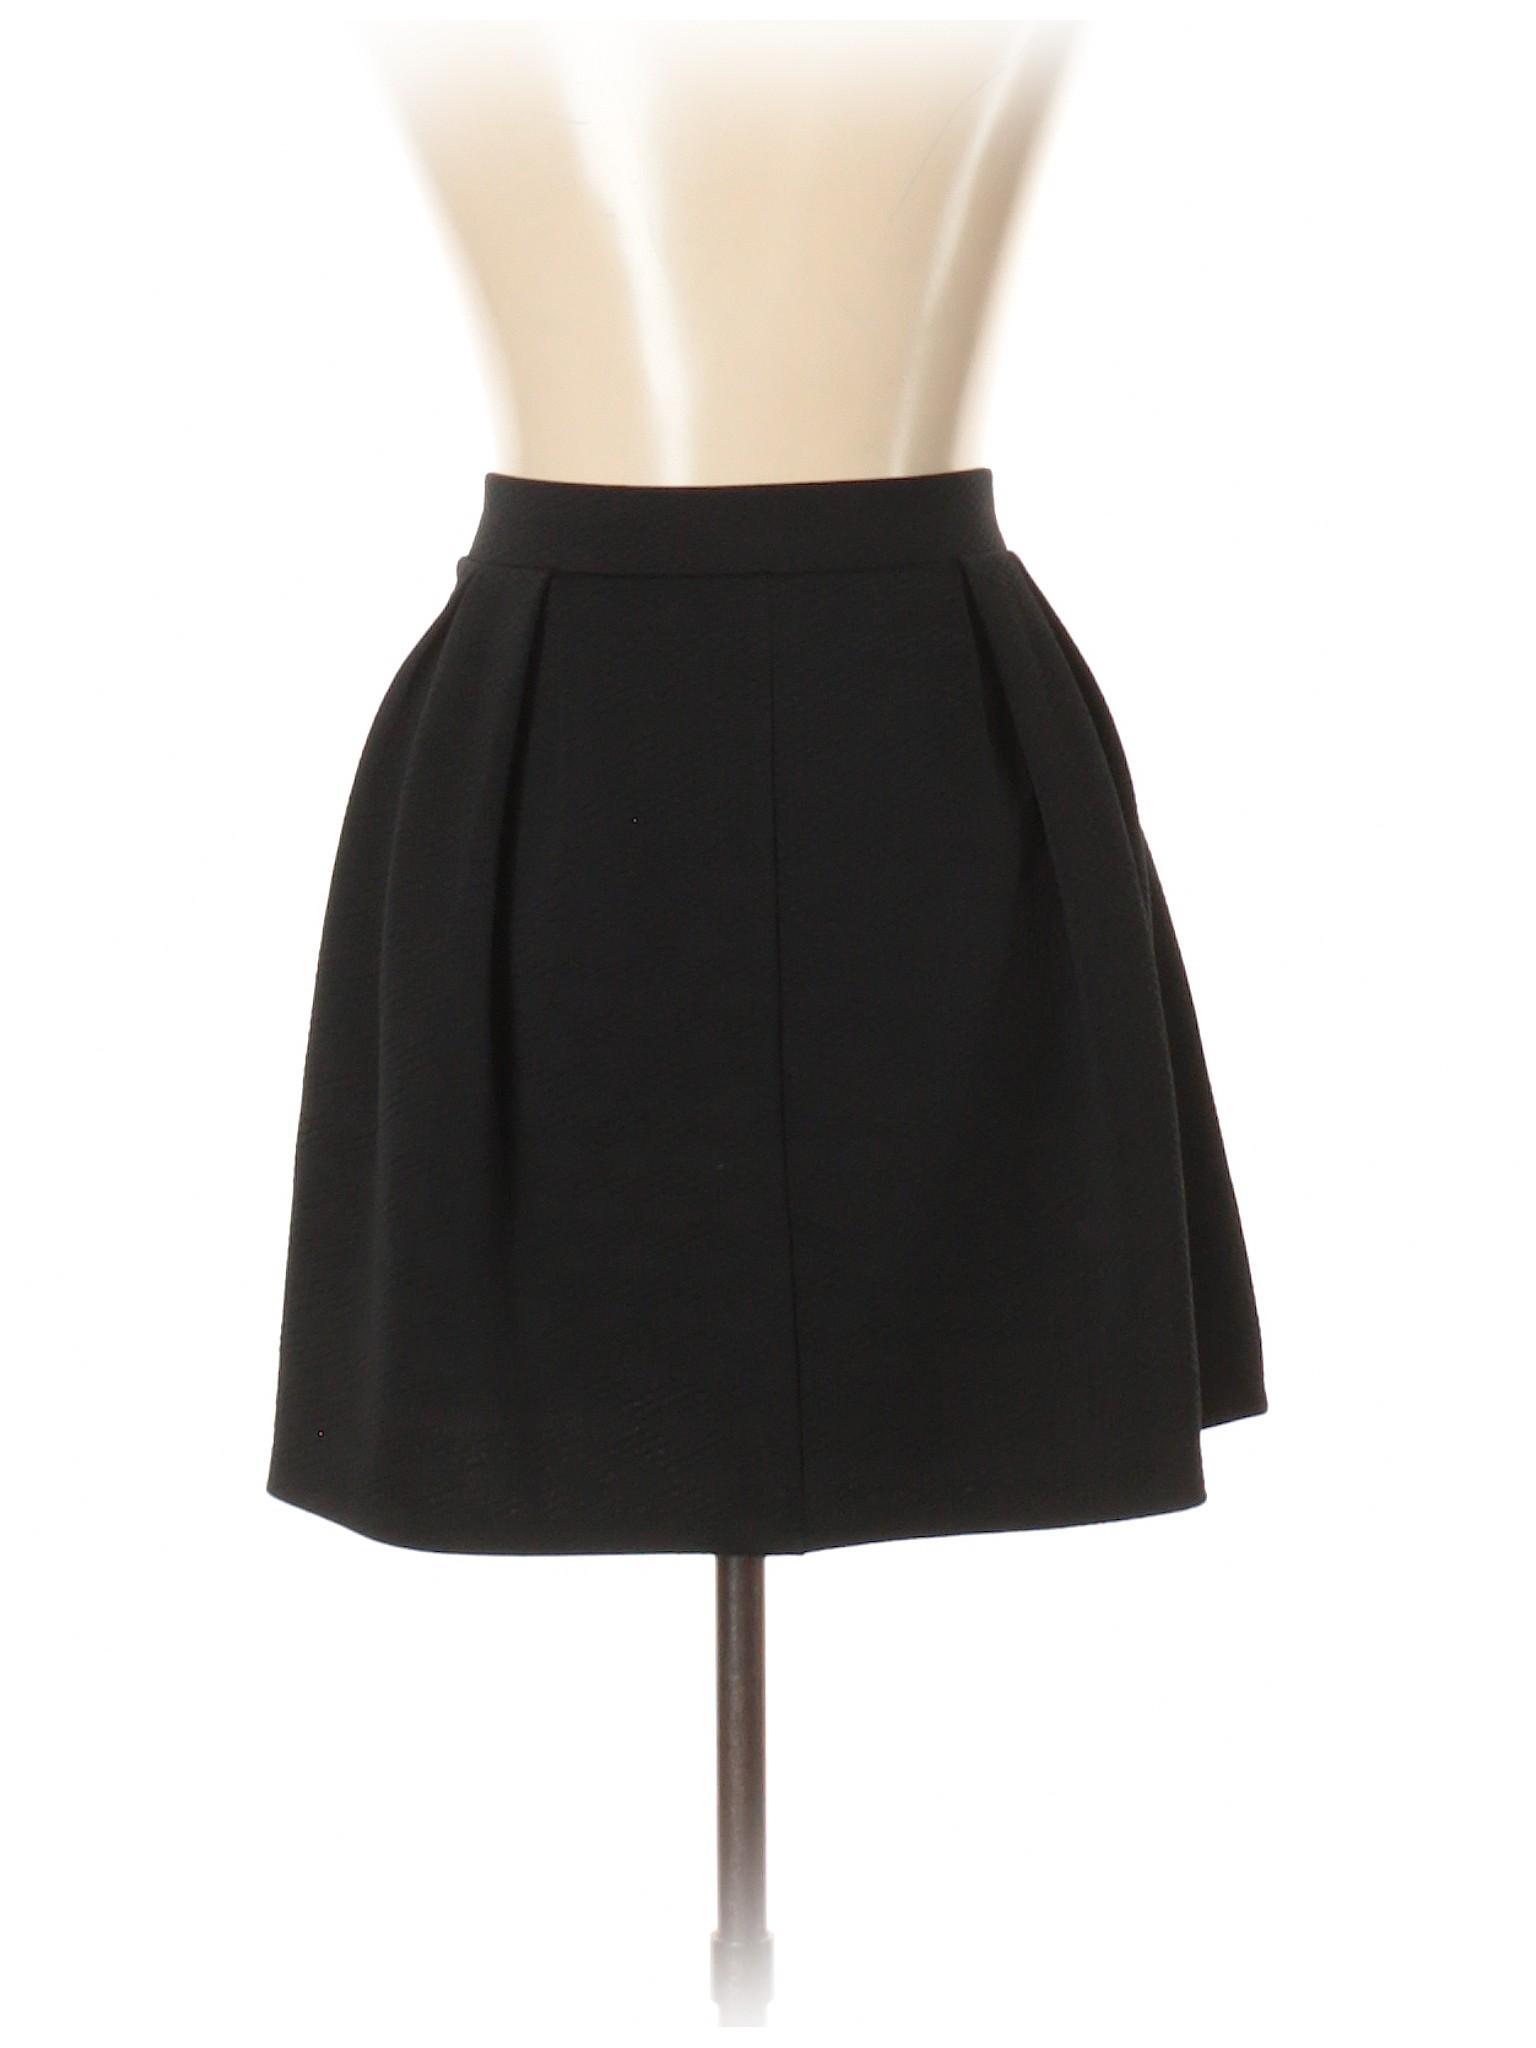 Skirt Casual by winter Benbasset Joe Joe Leisure B YxSwq0fx